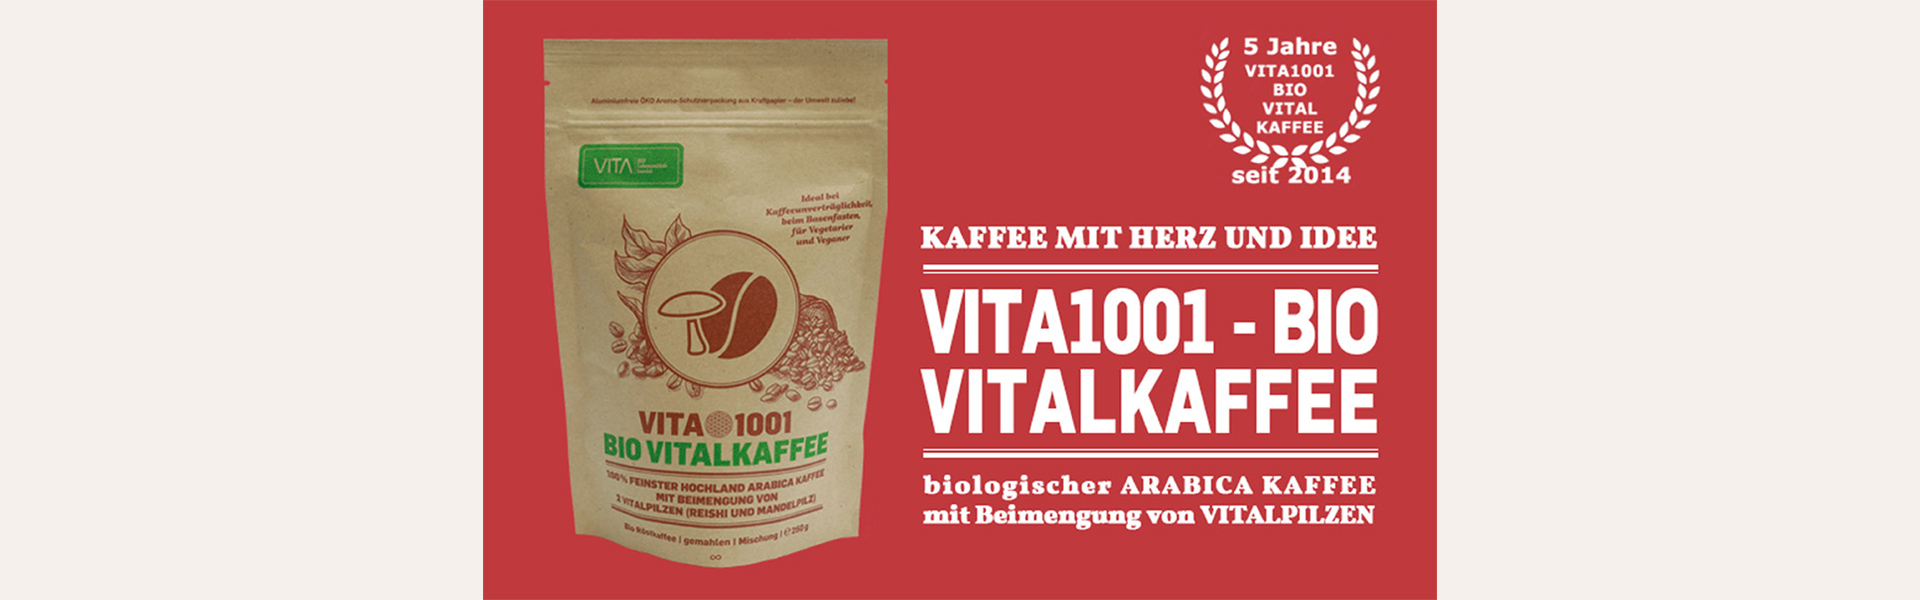 Slider09_Qi-Point-WL-VITA1001-Bio_Vitalkaffee